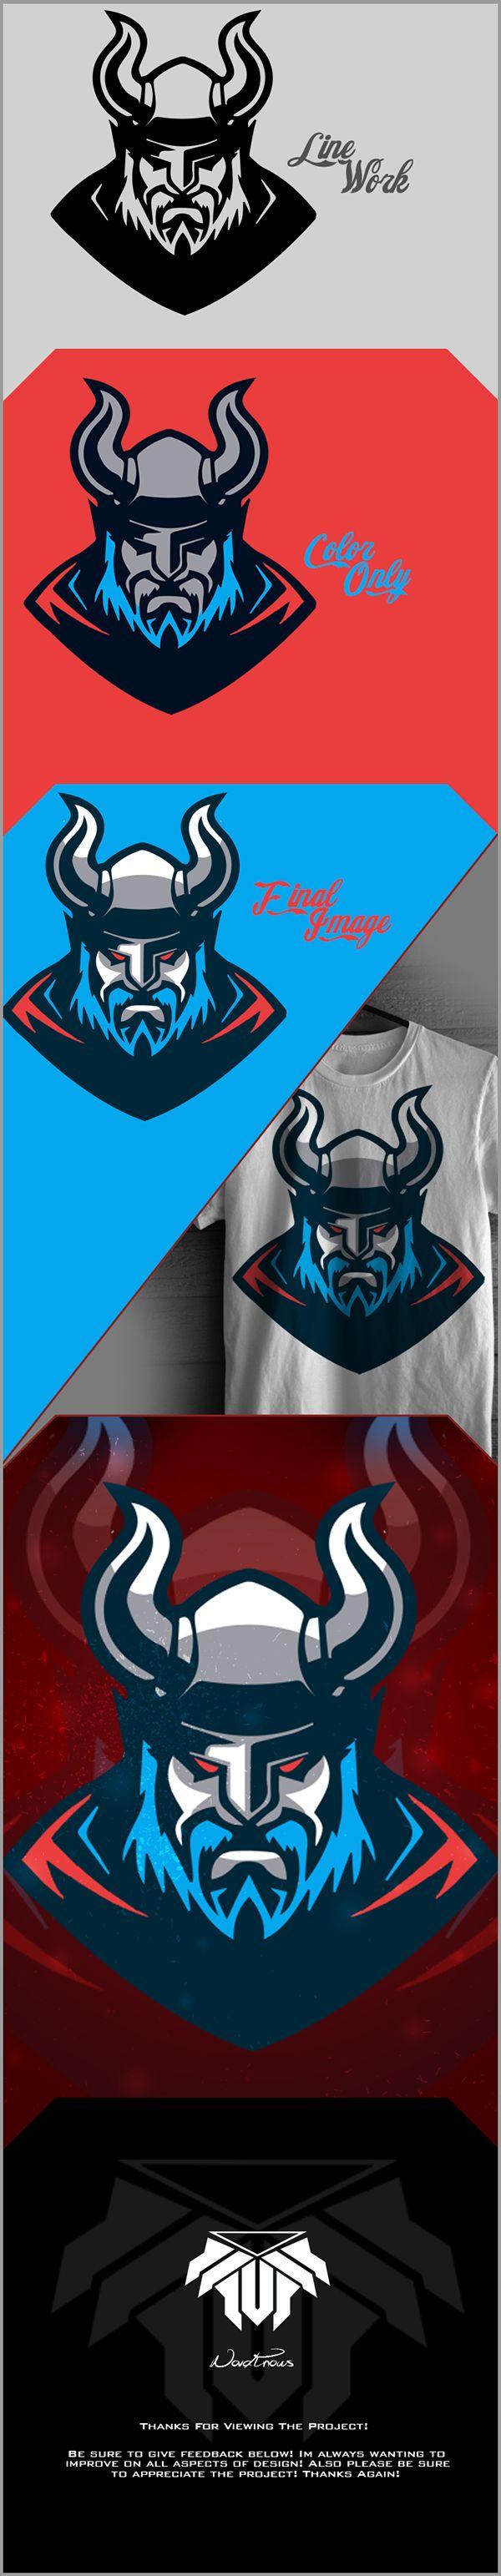 Viking Mascot Project on Behance